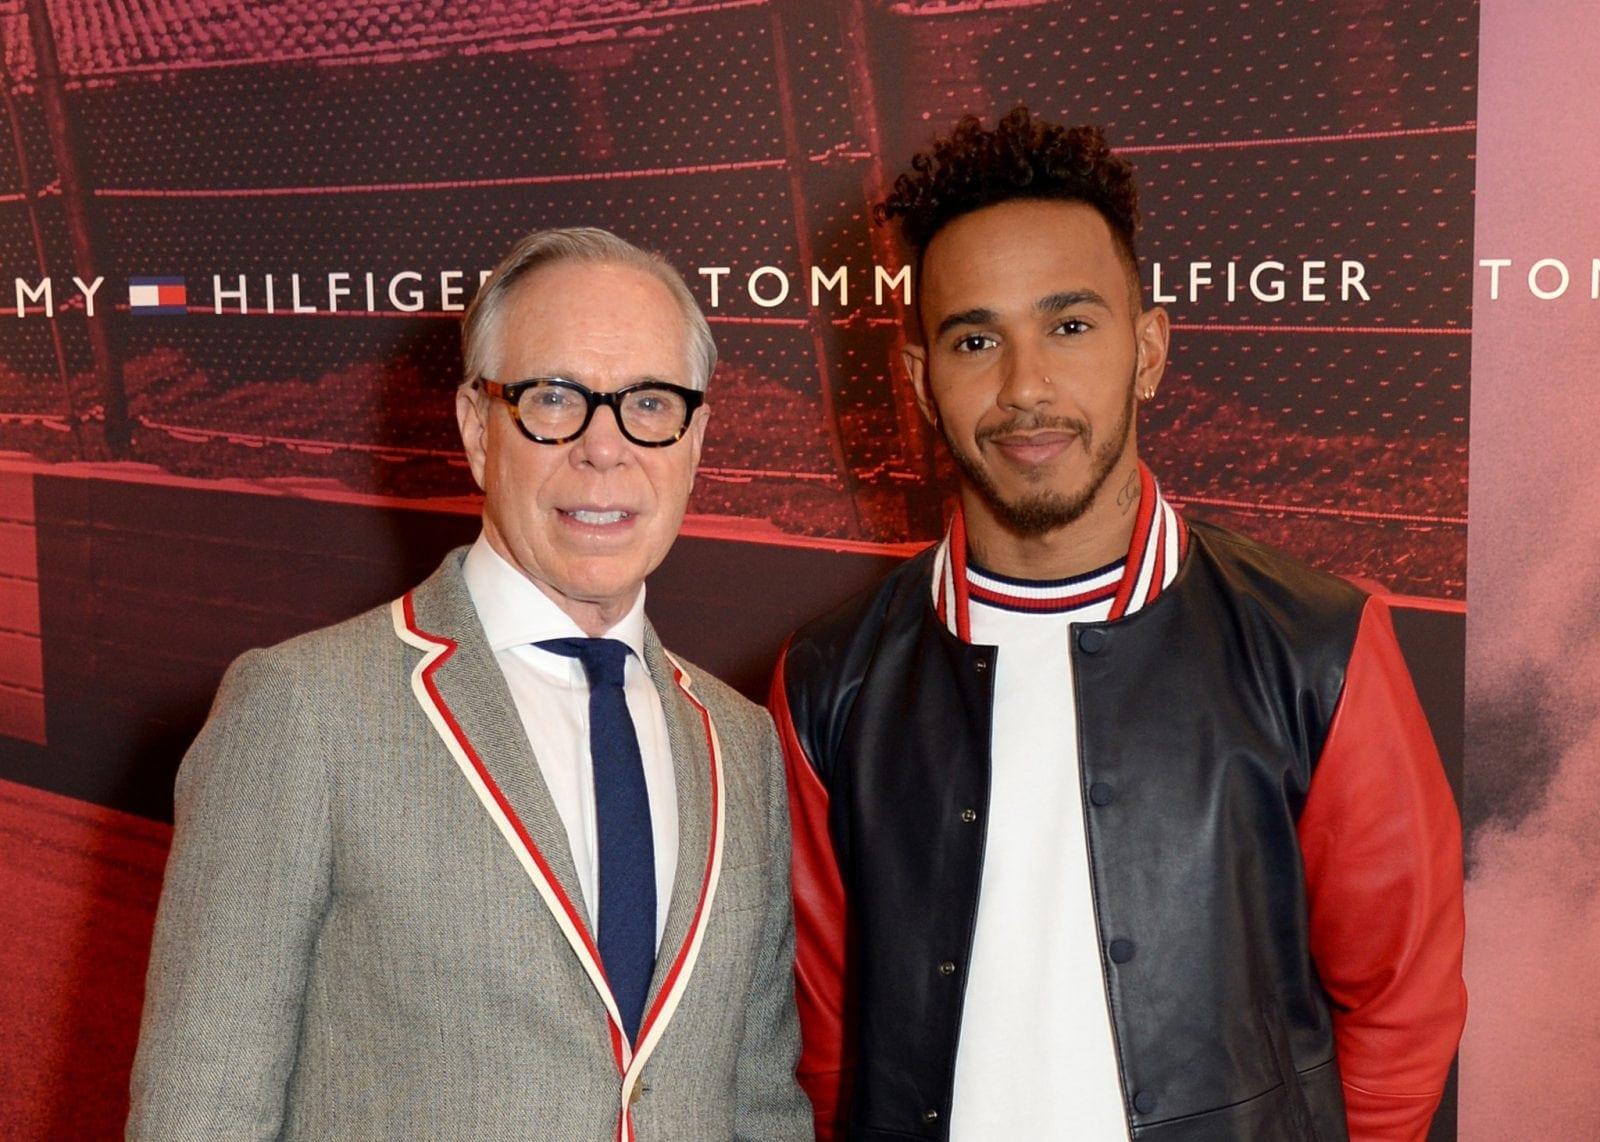 Lewis Hamilton global ambassador for Tommy Hilfiger announcement, London, UK - 13 Mar 2018